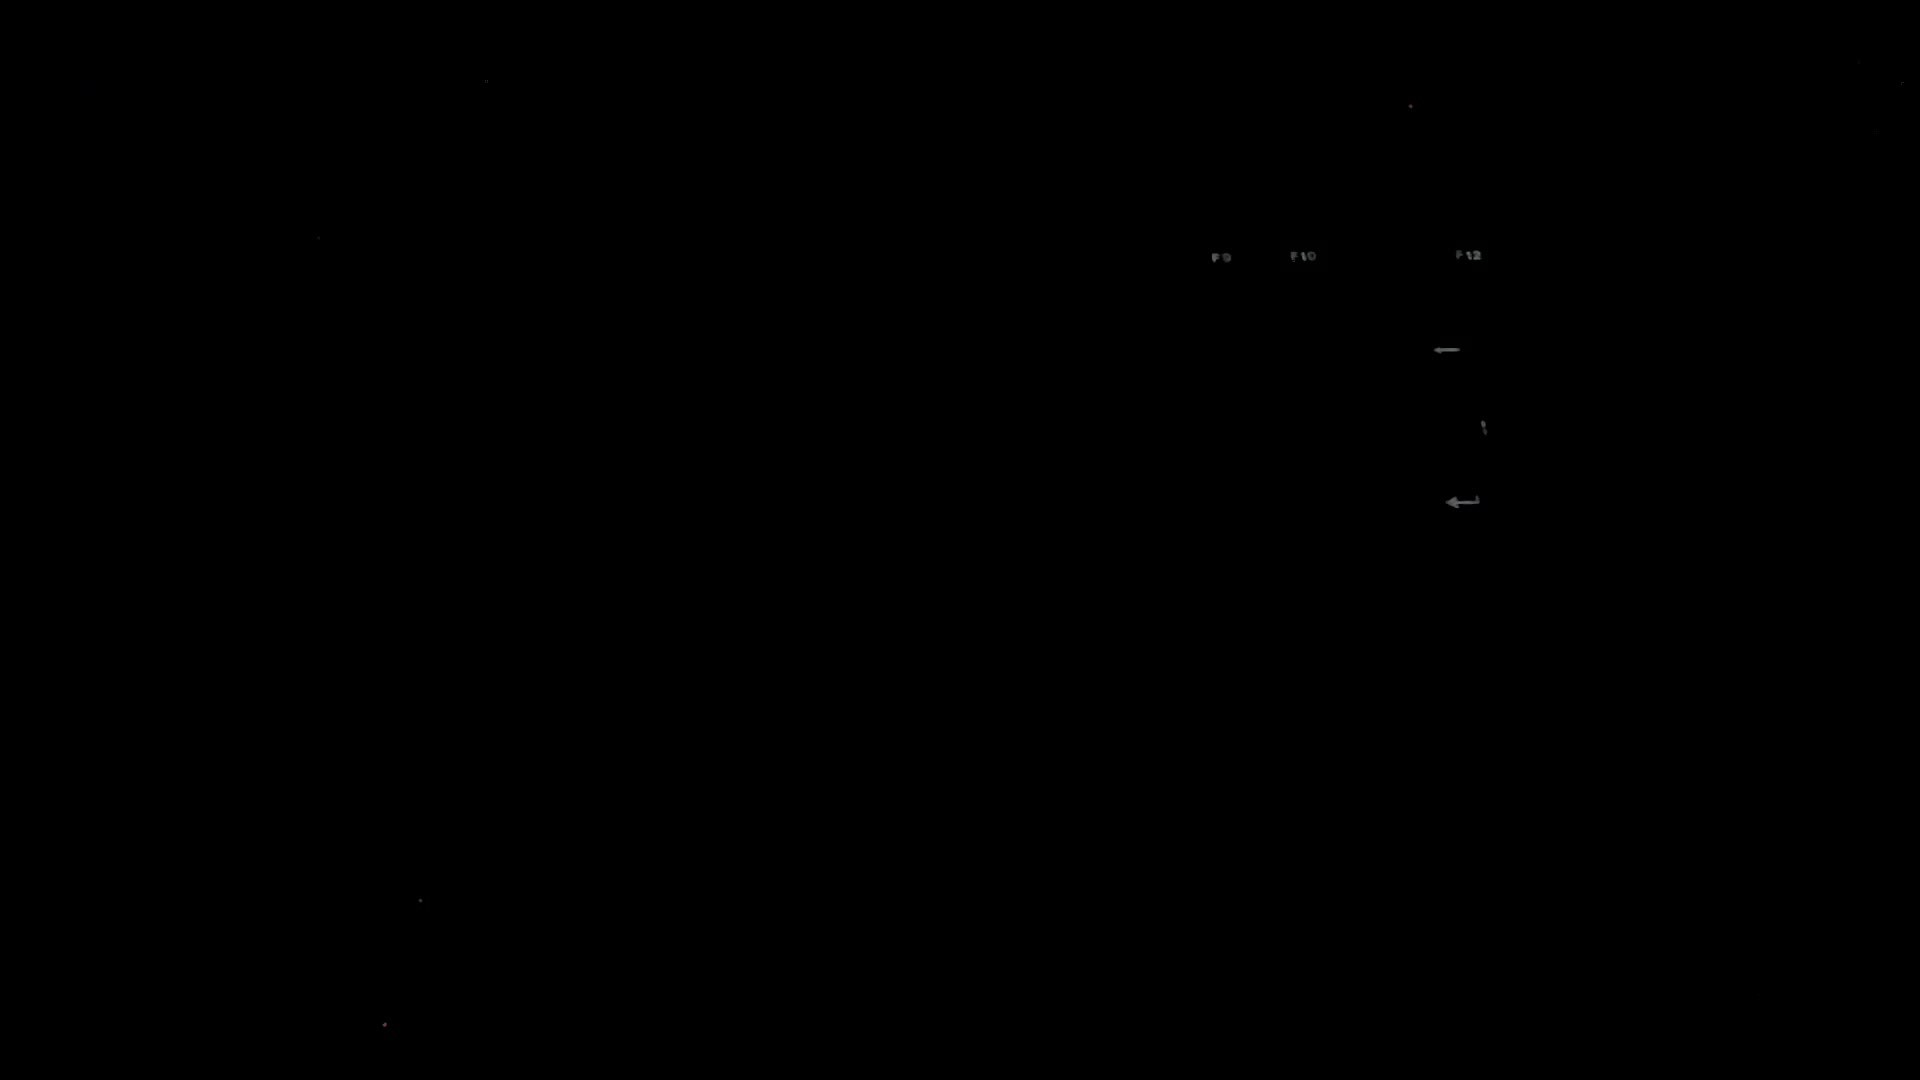 mechanicalkeyboards, MKC Geekey 87a snake (dark) GIFs